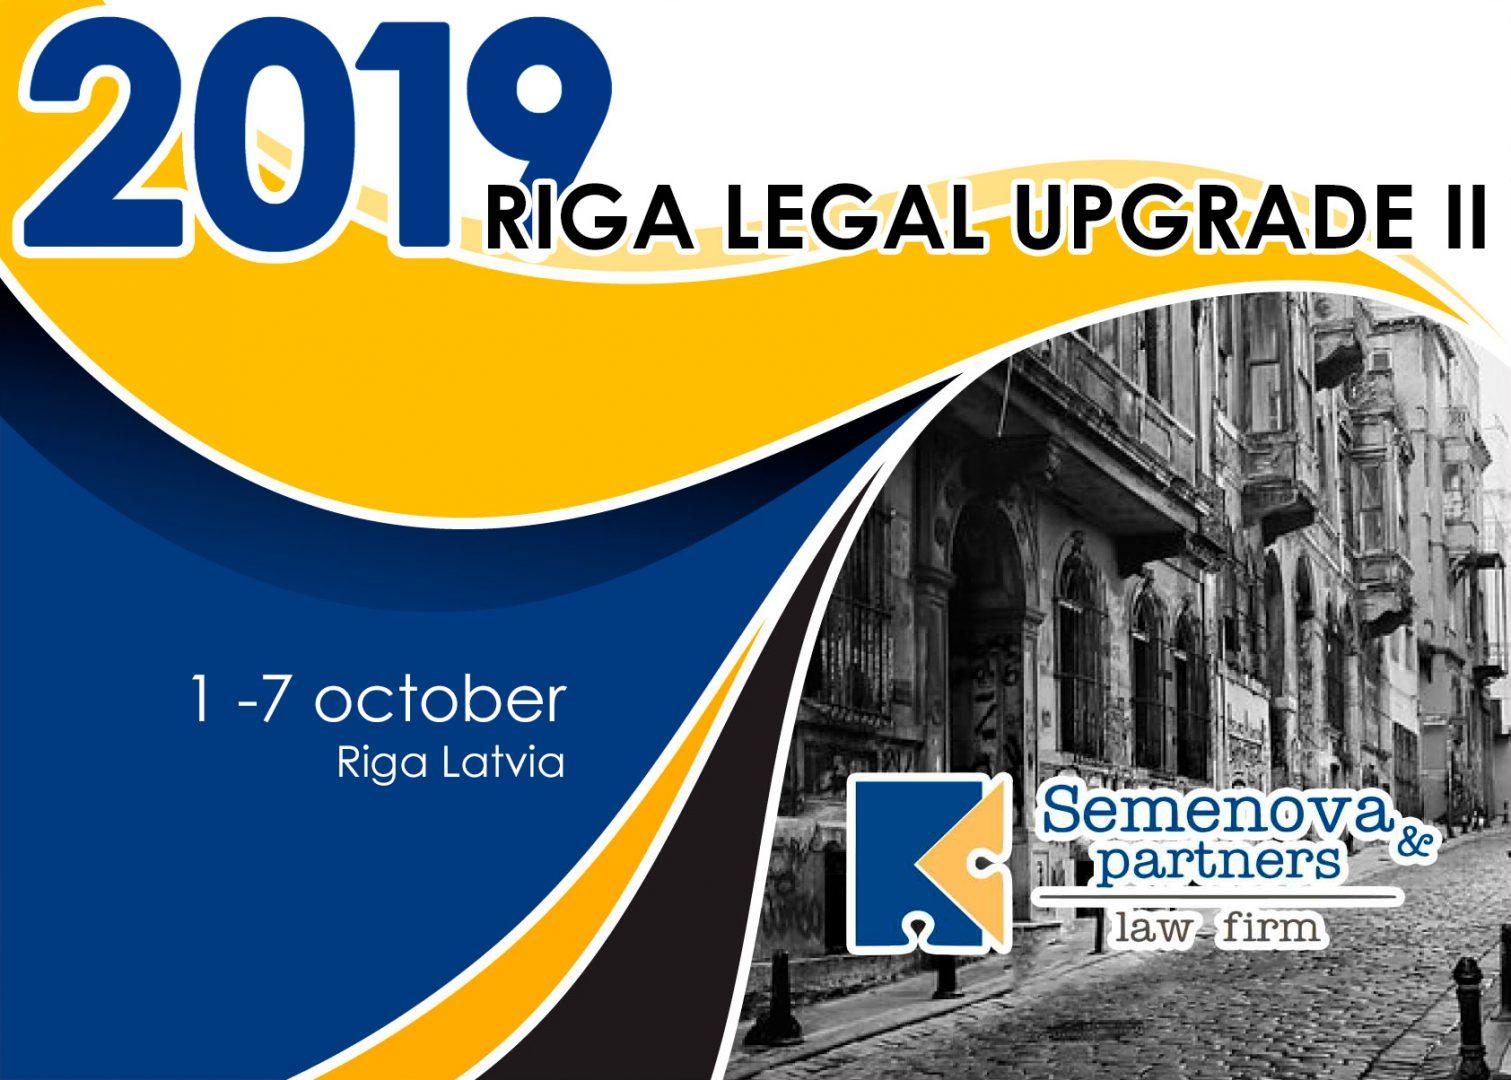 RIGA LEGAL UPGRADE II